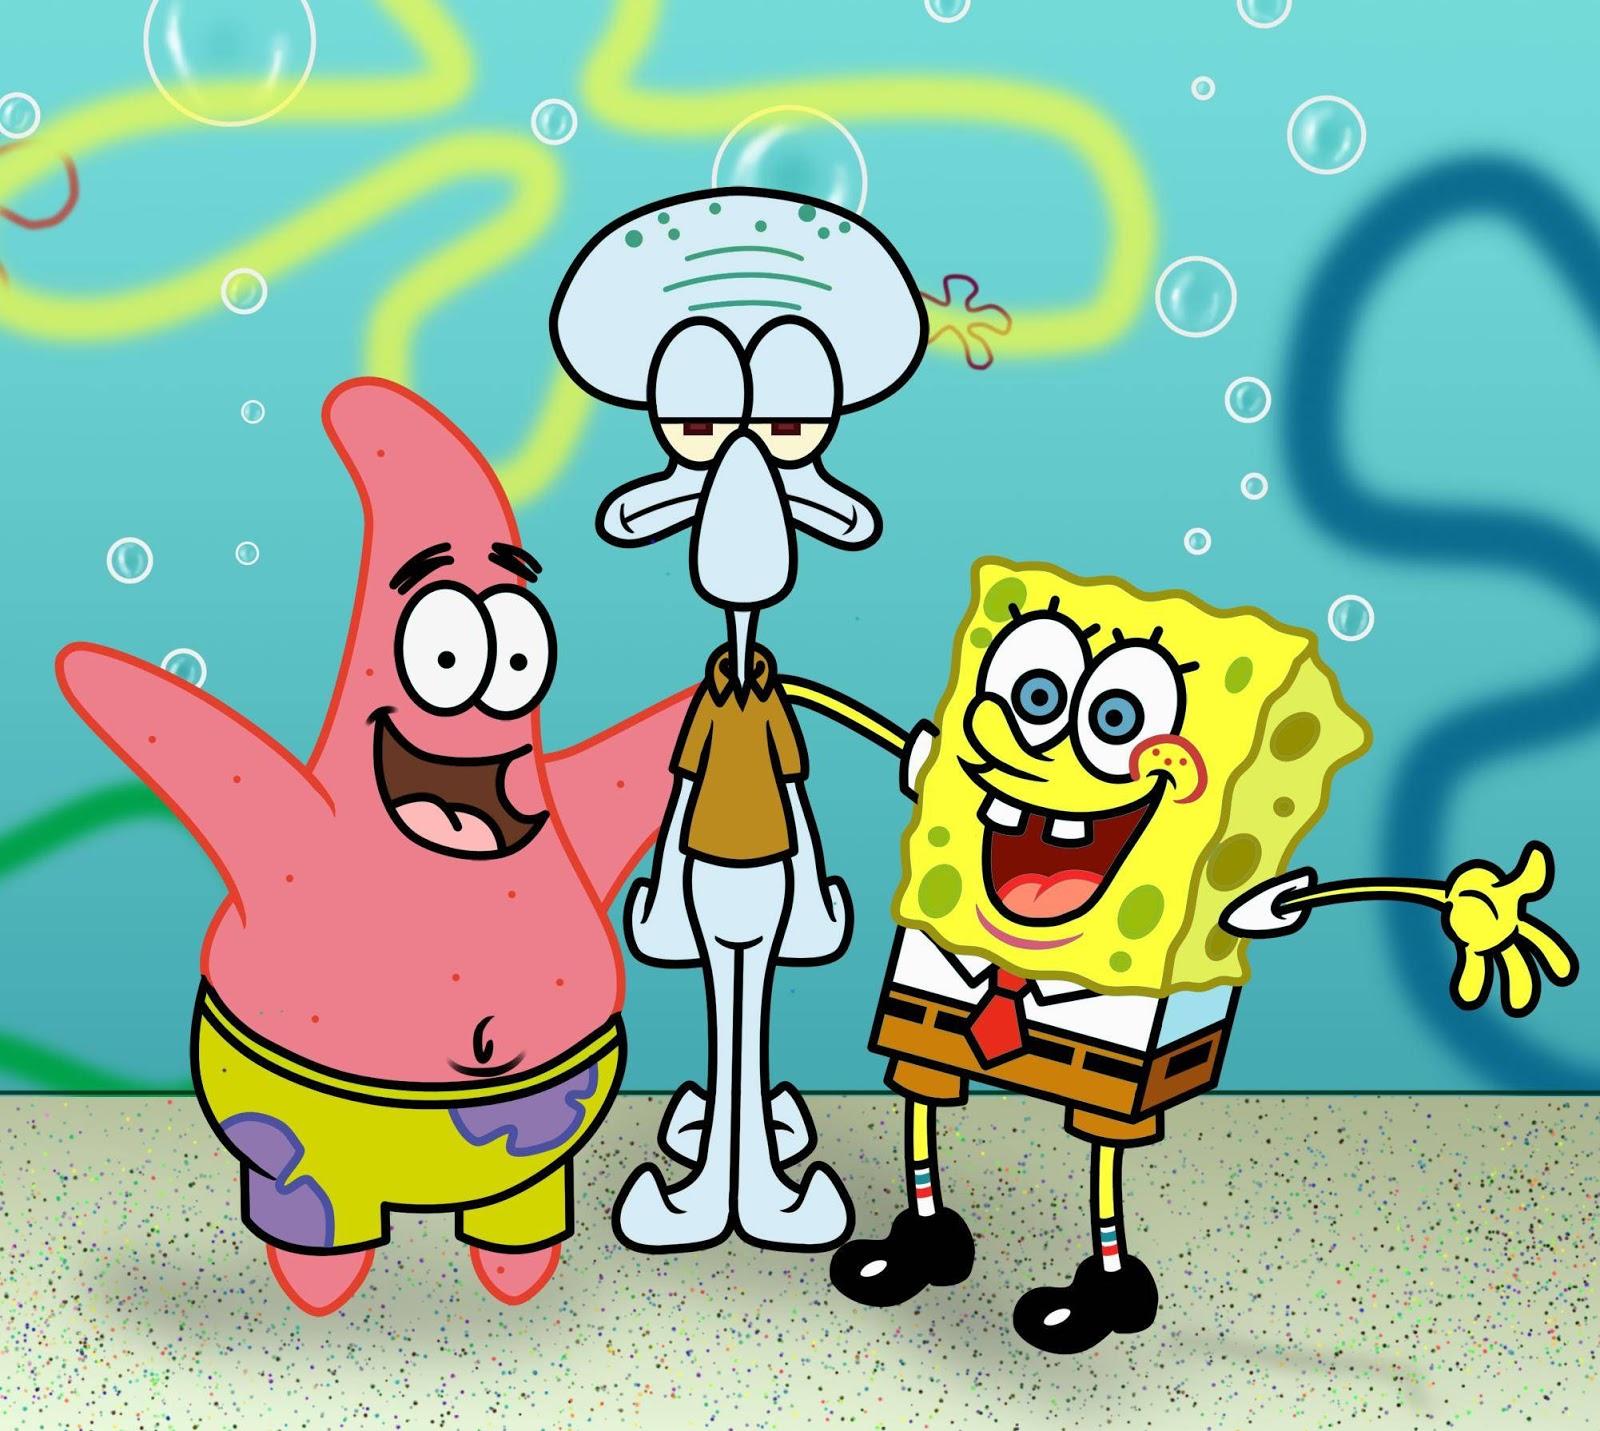 Gambar Kata Kata Lucu Kartun Spongebob  Kata Kata Mutiara